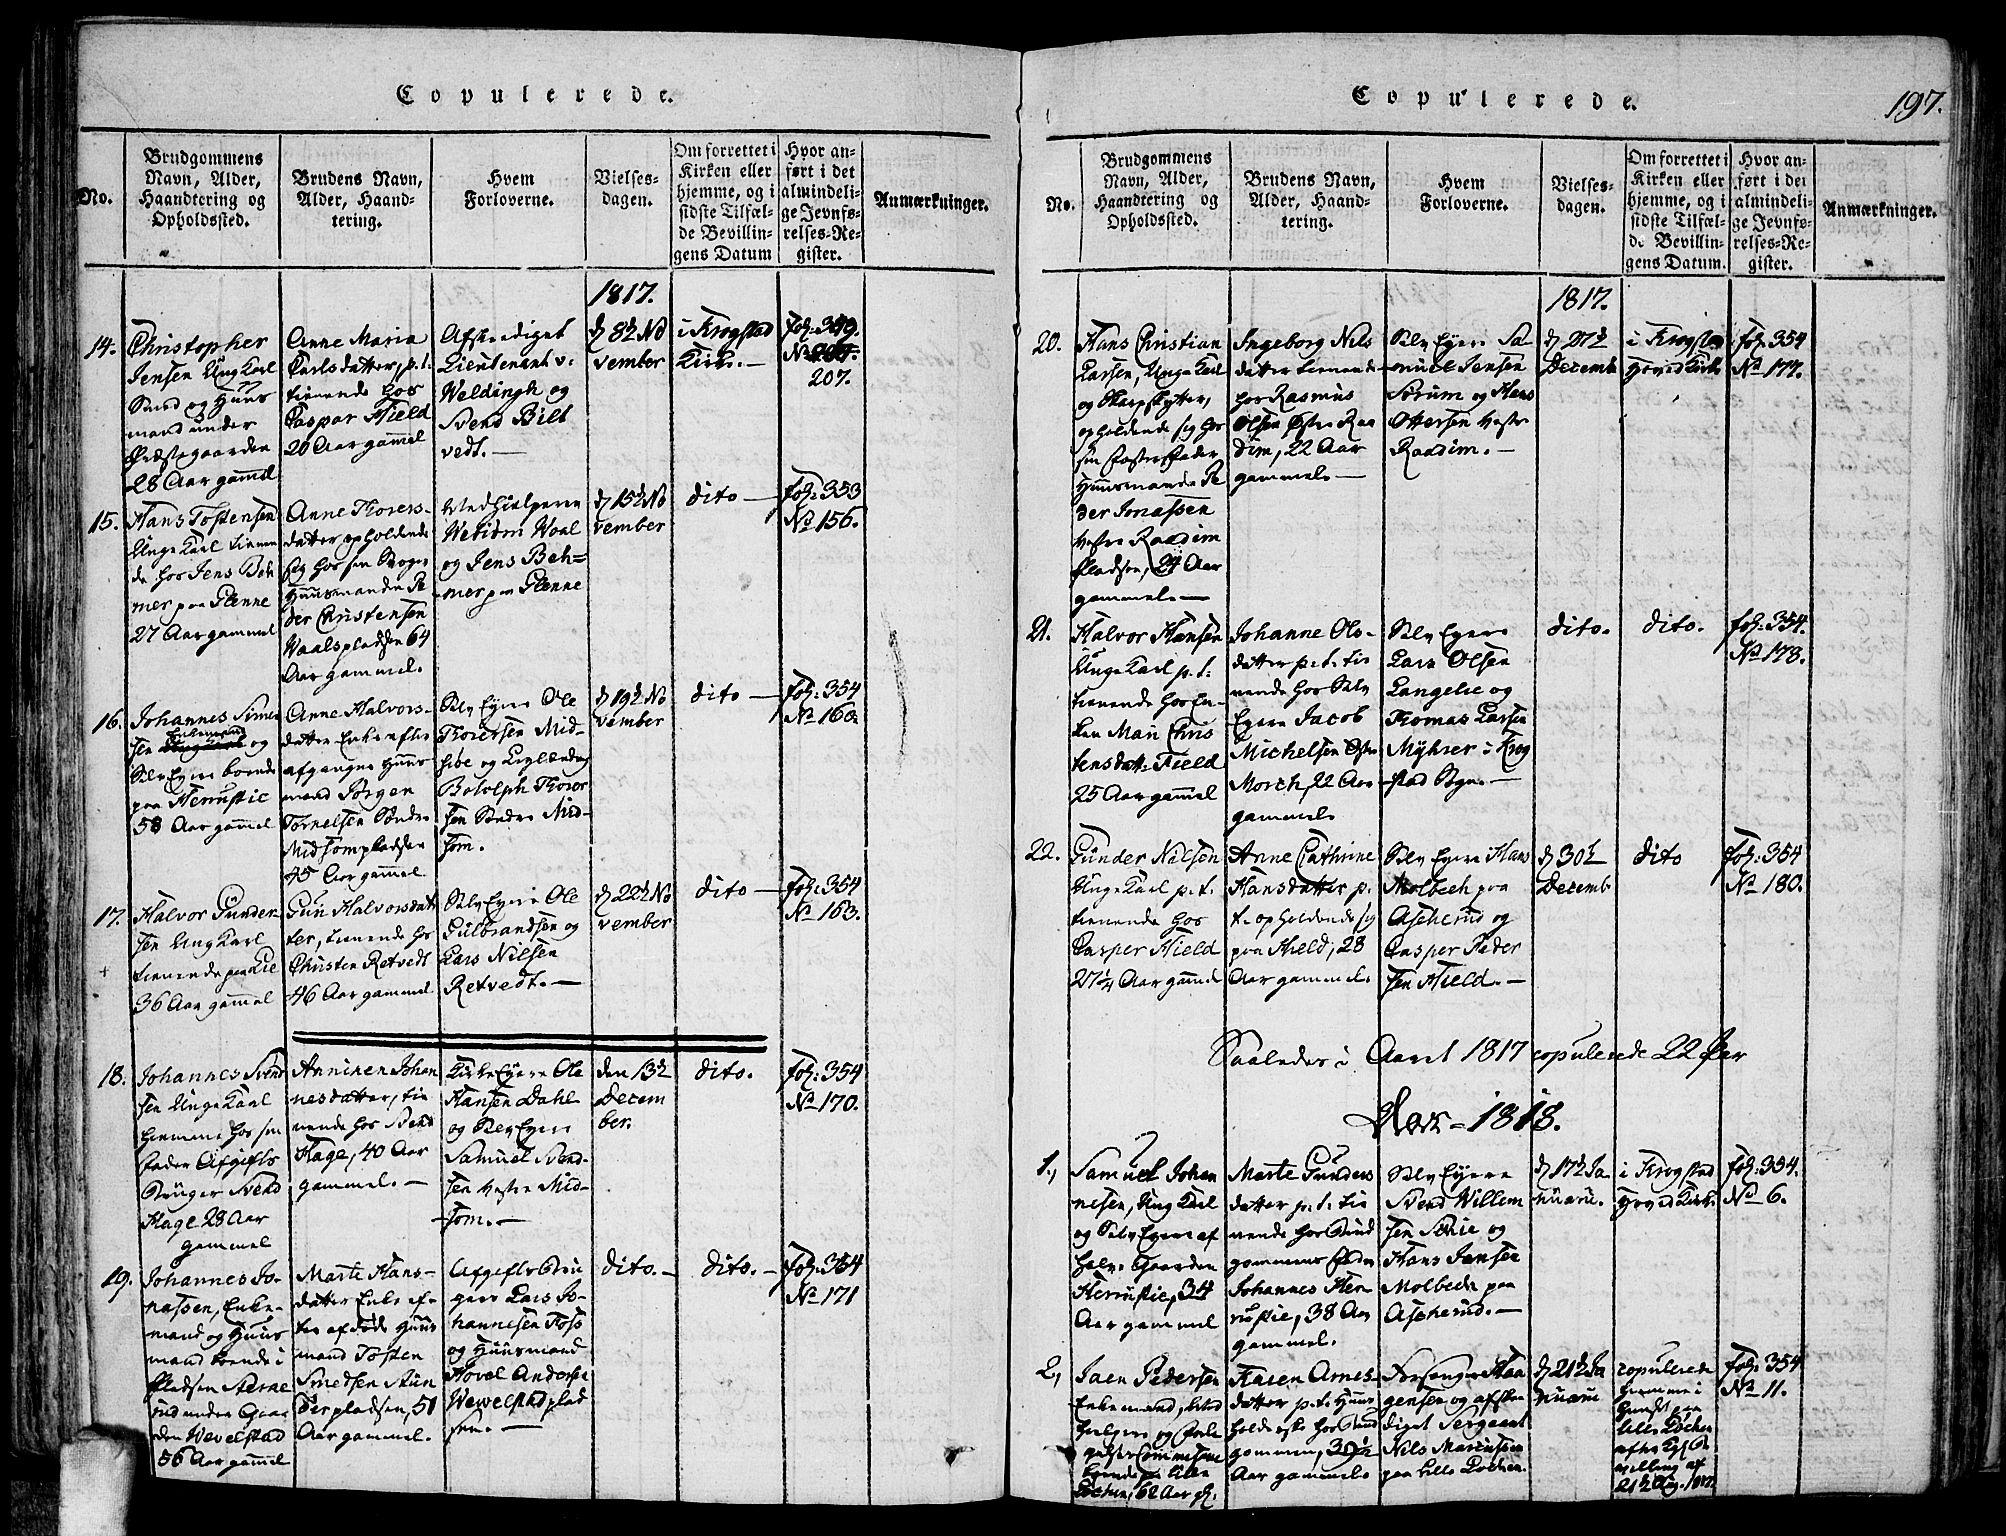 SAO, Kråkstad prestekontor Kirkebøker, F/Fa/L0003: Ministerialbok nr. I 3, 1813-1824, s. 197